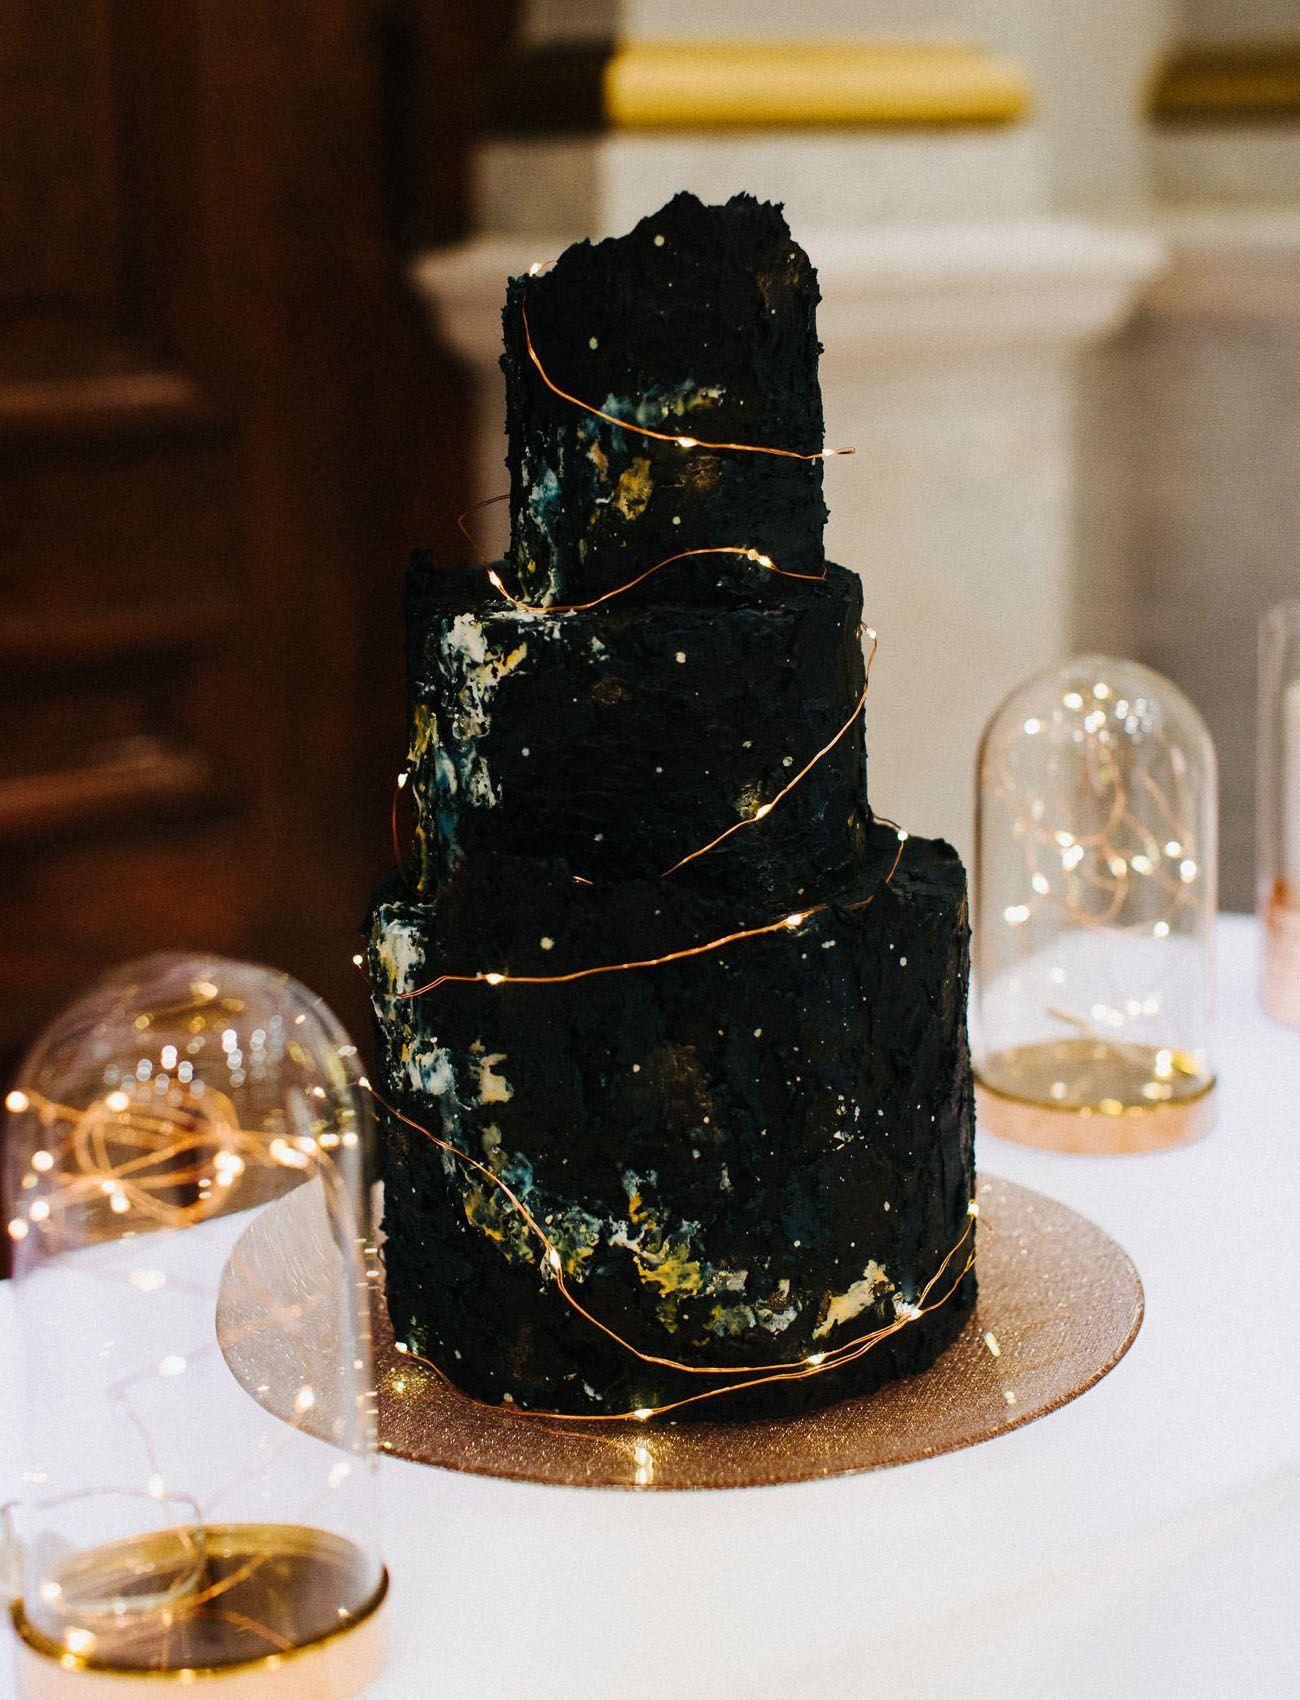 Tswana traditional wedding decor 2018  celestial wedding cake  Cakes and Cupcakes  Pinterest  Wedding